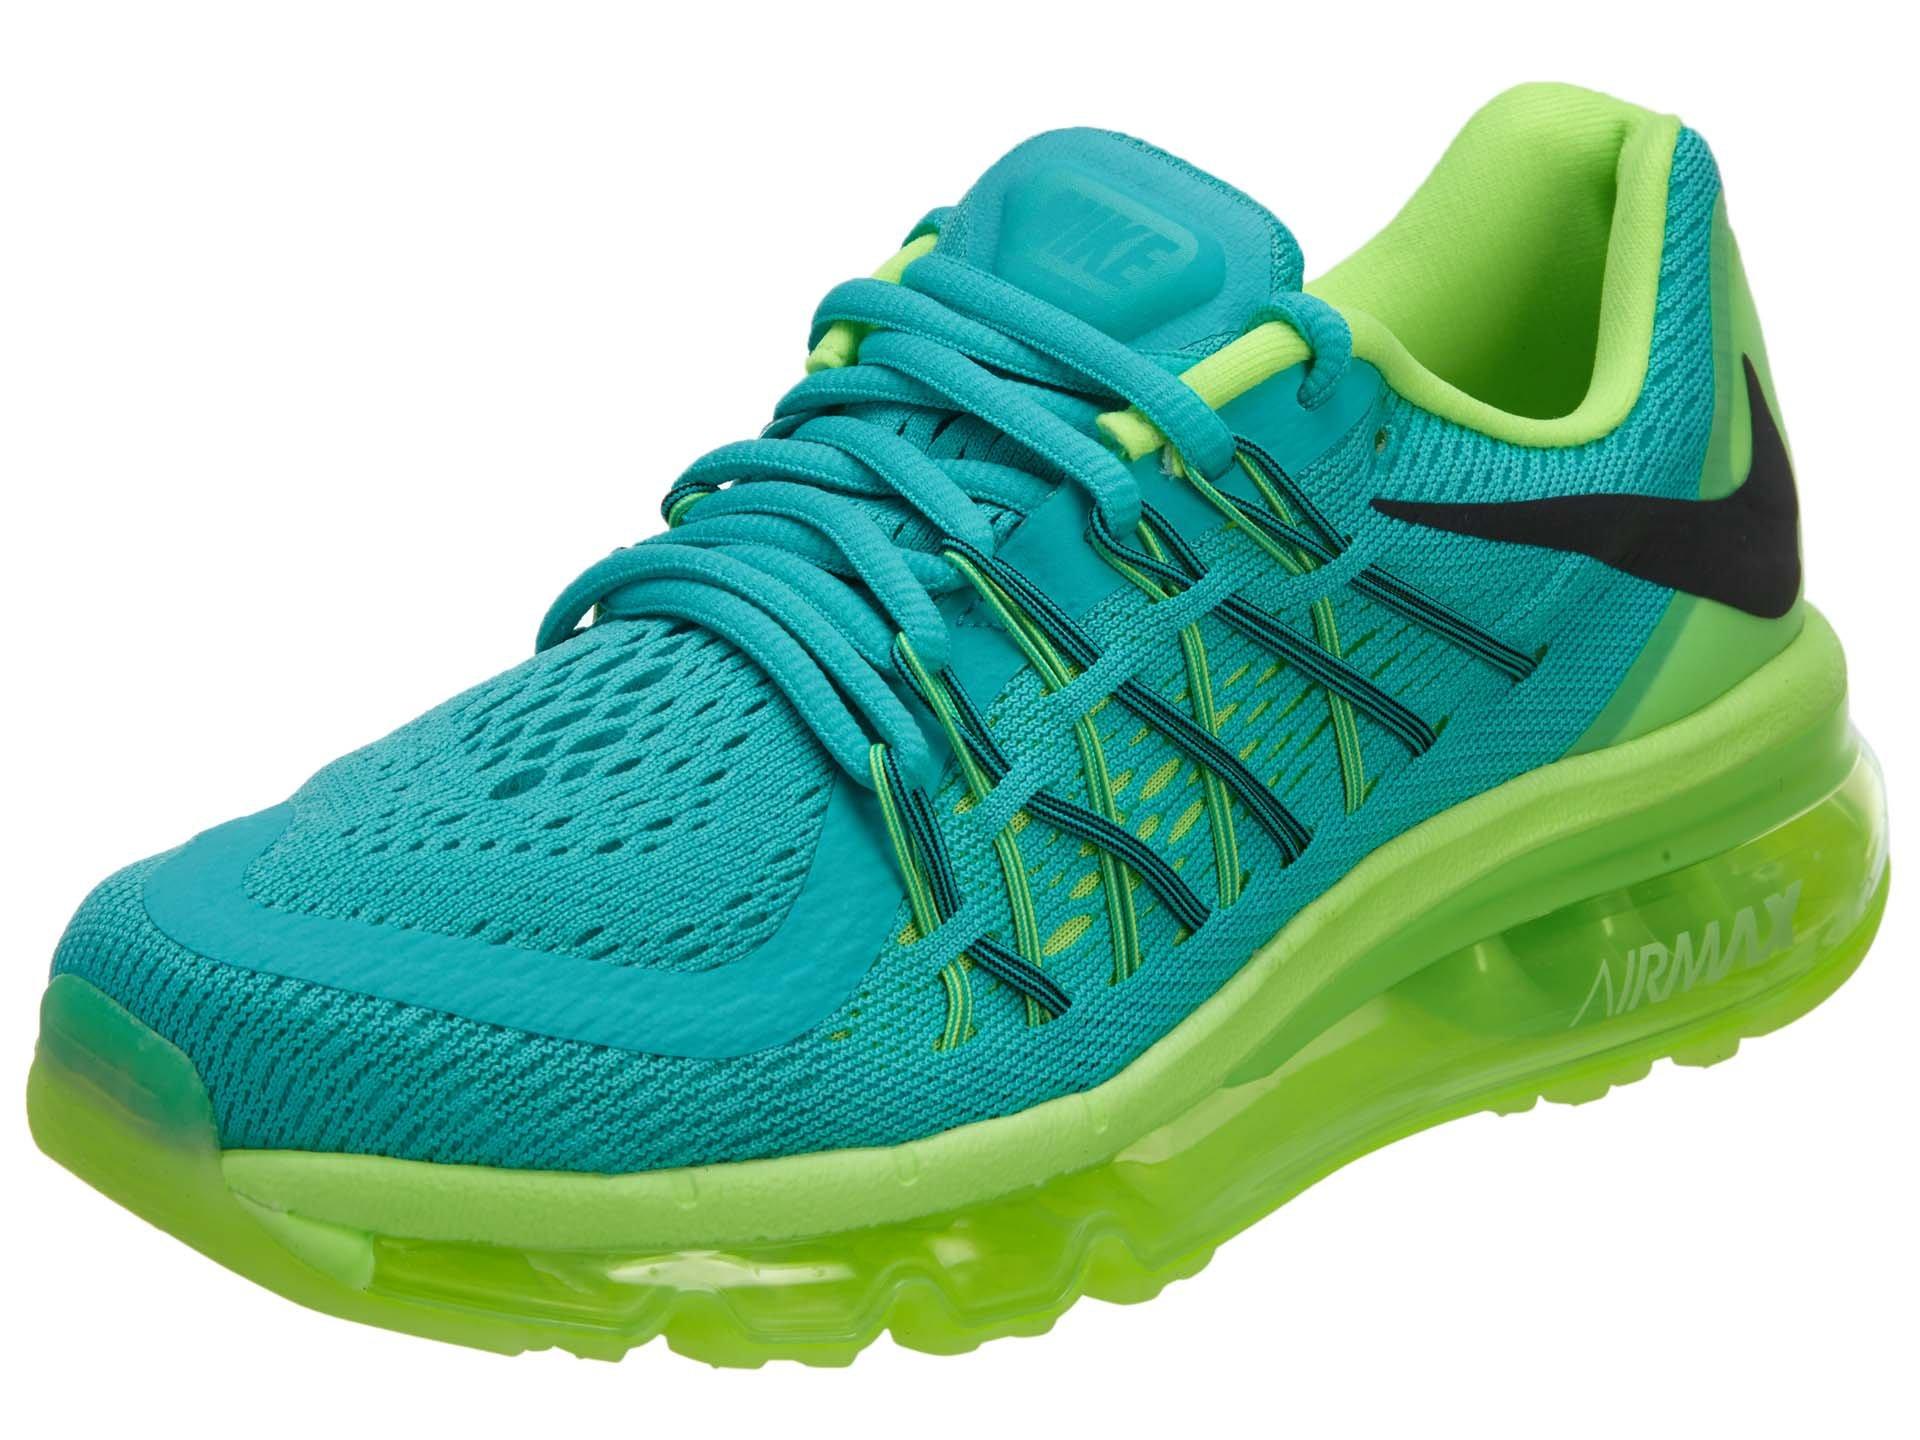 Nike Nike Air Max 2015 Womens Style: 698903-400 Size: 6